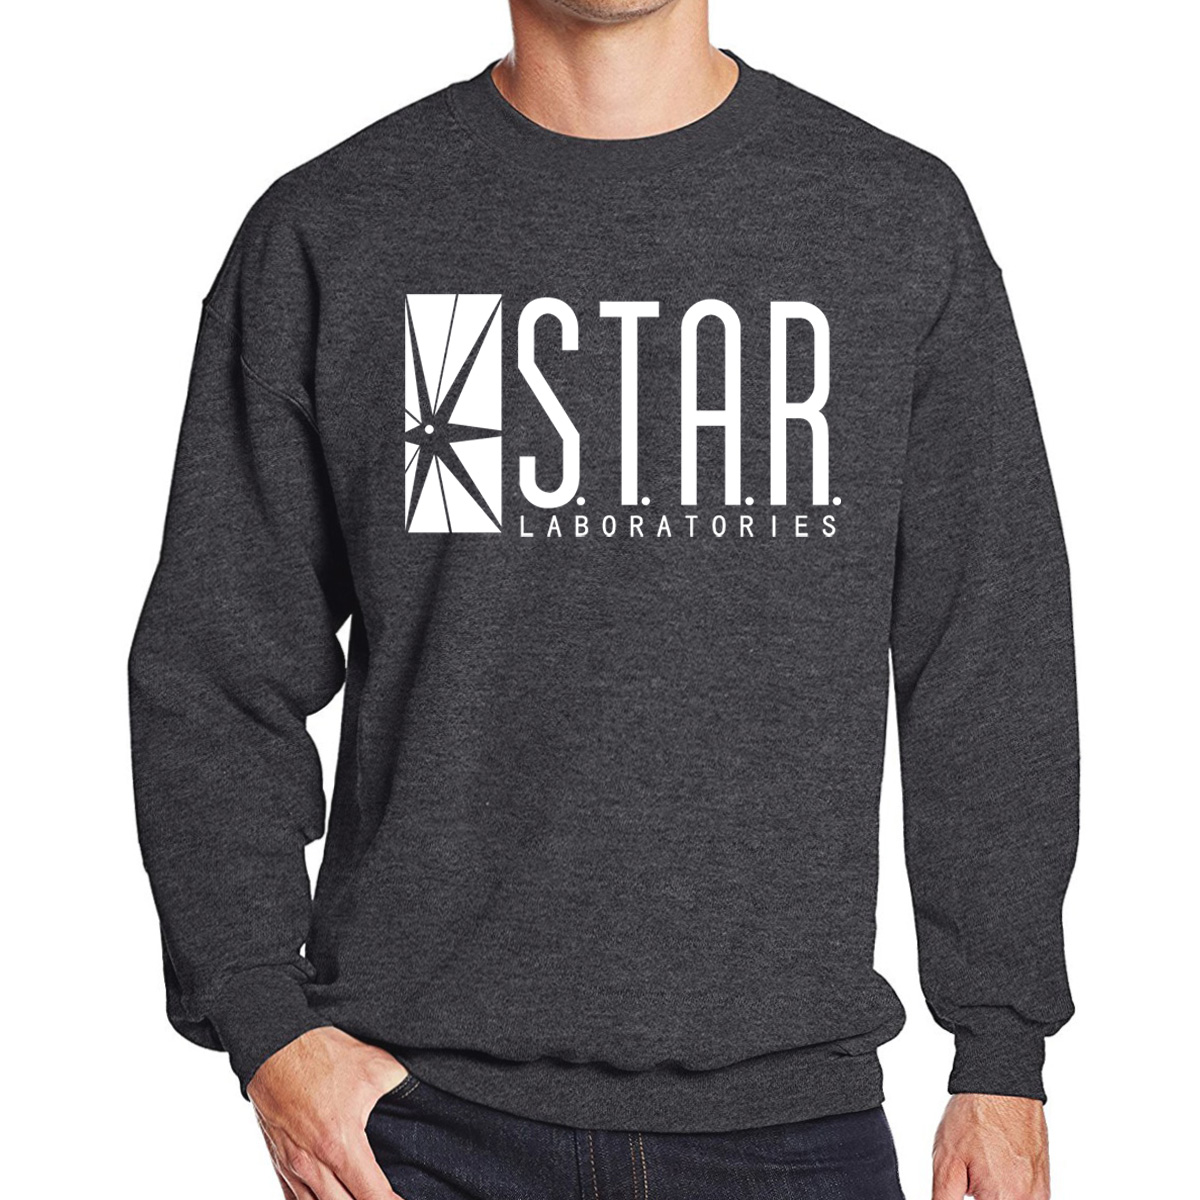 STAR Laboratories Printed Hoodies Men Sweatshirts The BIG BANG Theory Streetwear 2019 Autumn Pullover Mens Sweatshirt Sportswear